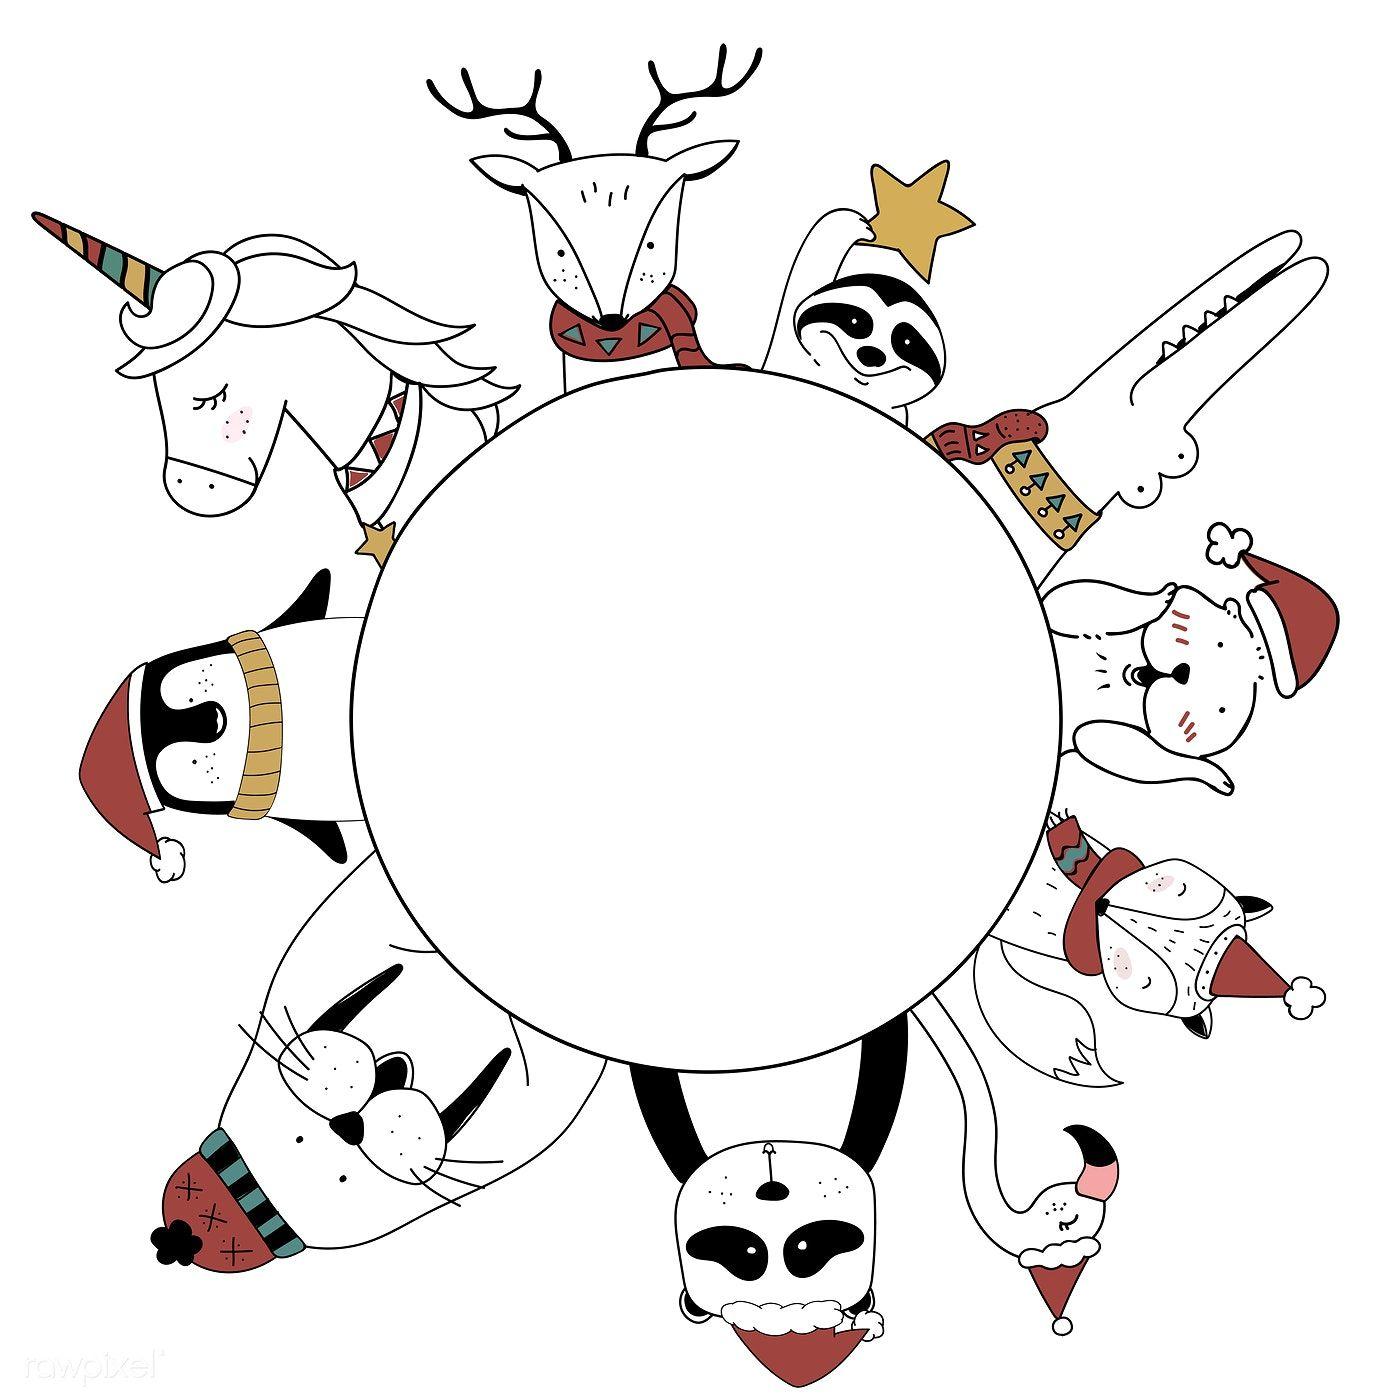 Download premium illustration of Hand drawn animals